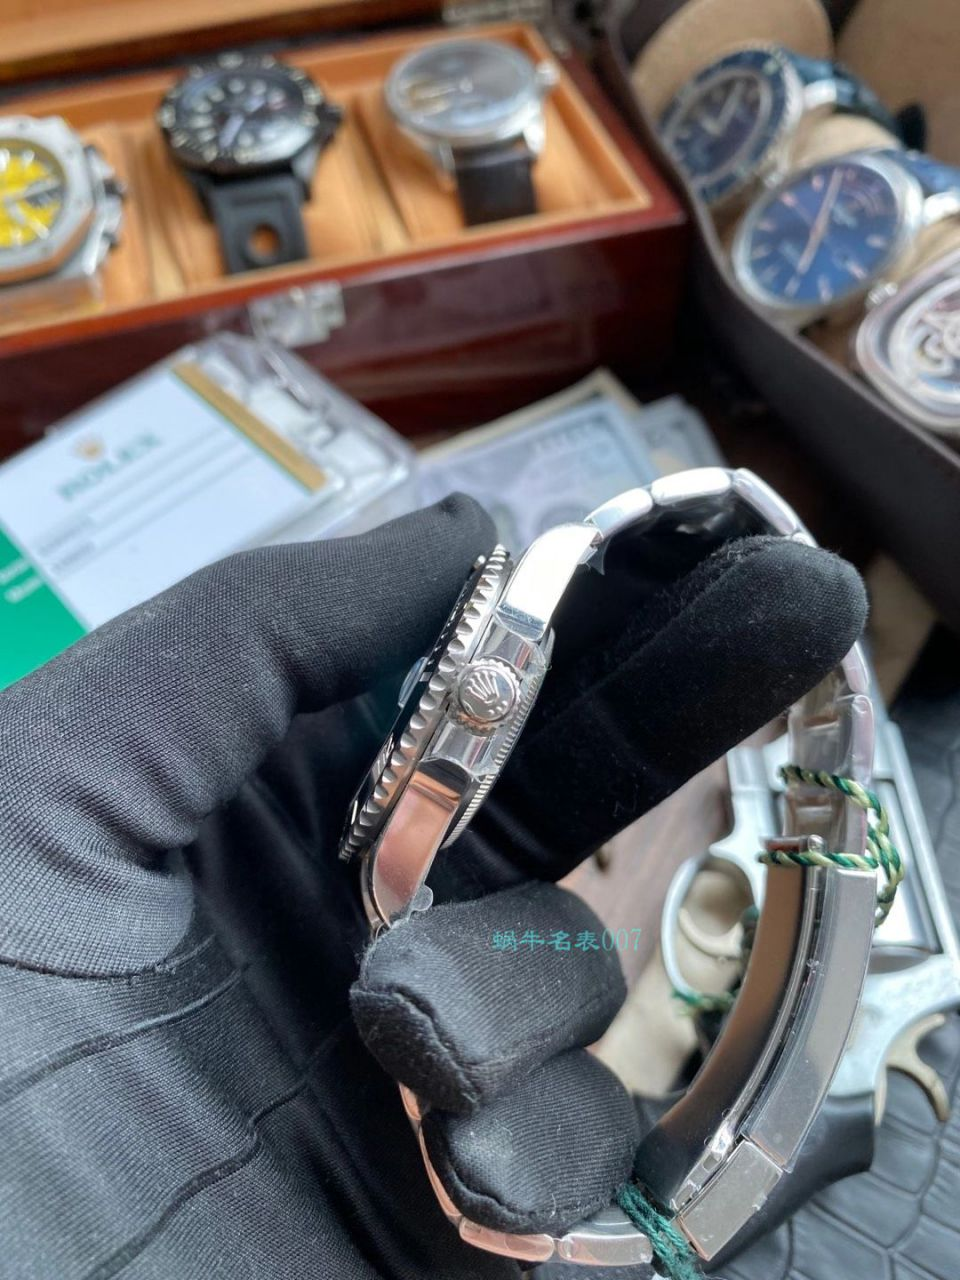 VS厂1比1复刻手表ROLEX劳力士黑水鬼3135机芯116610LN-97200手表 / R669